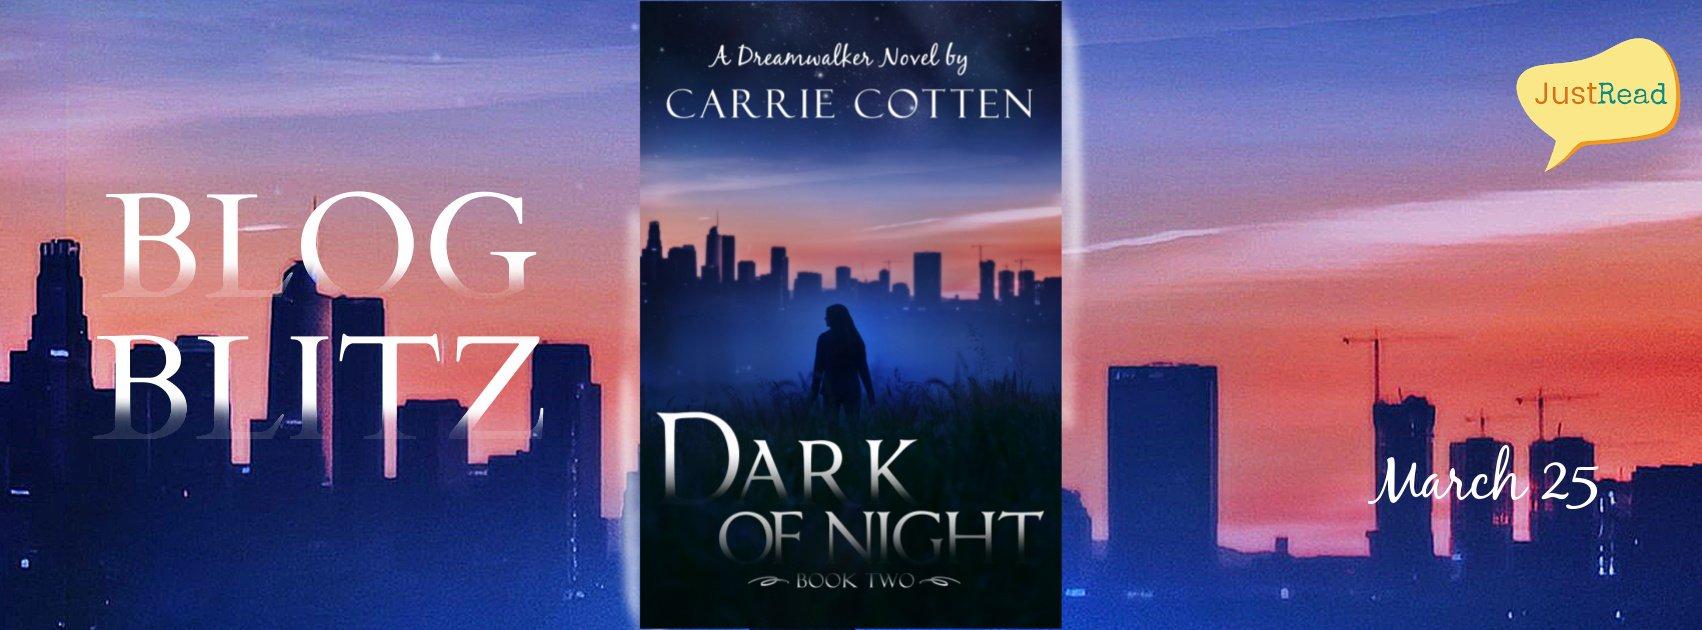 Dark of Night JustRead Blog Blitz